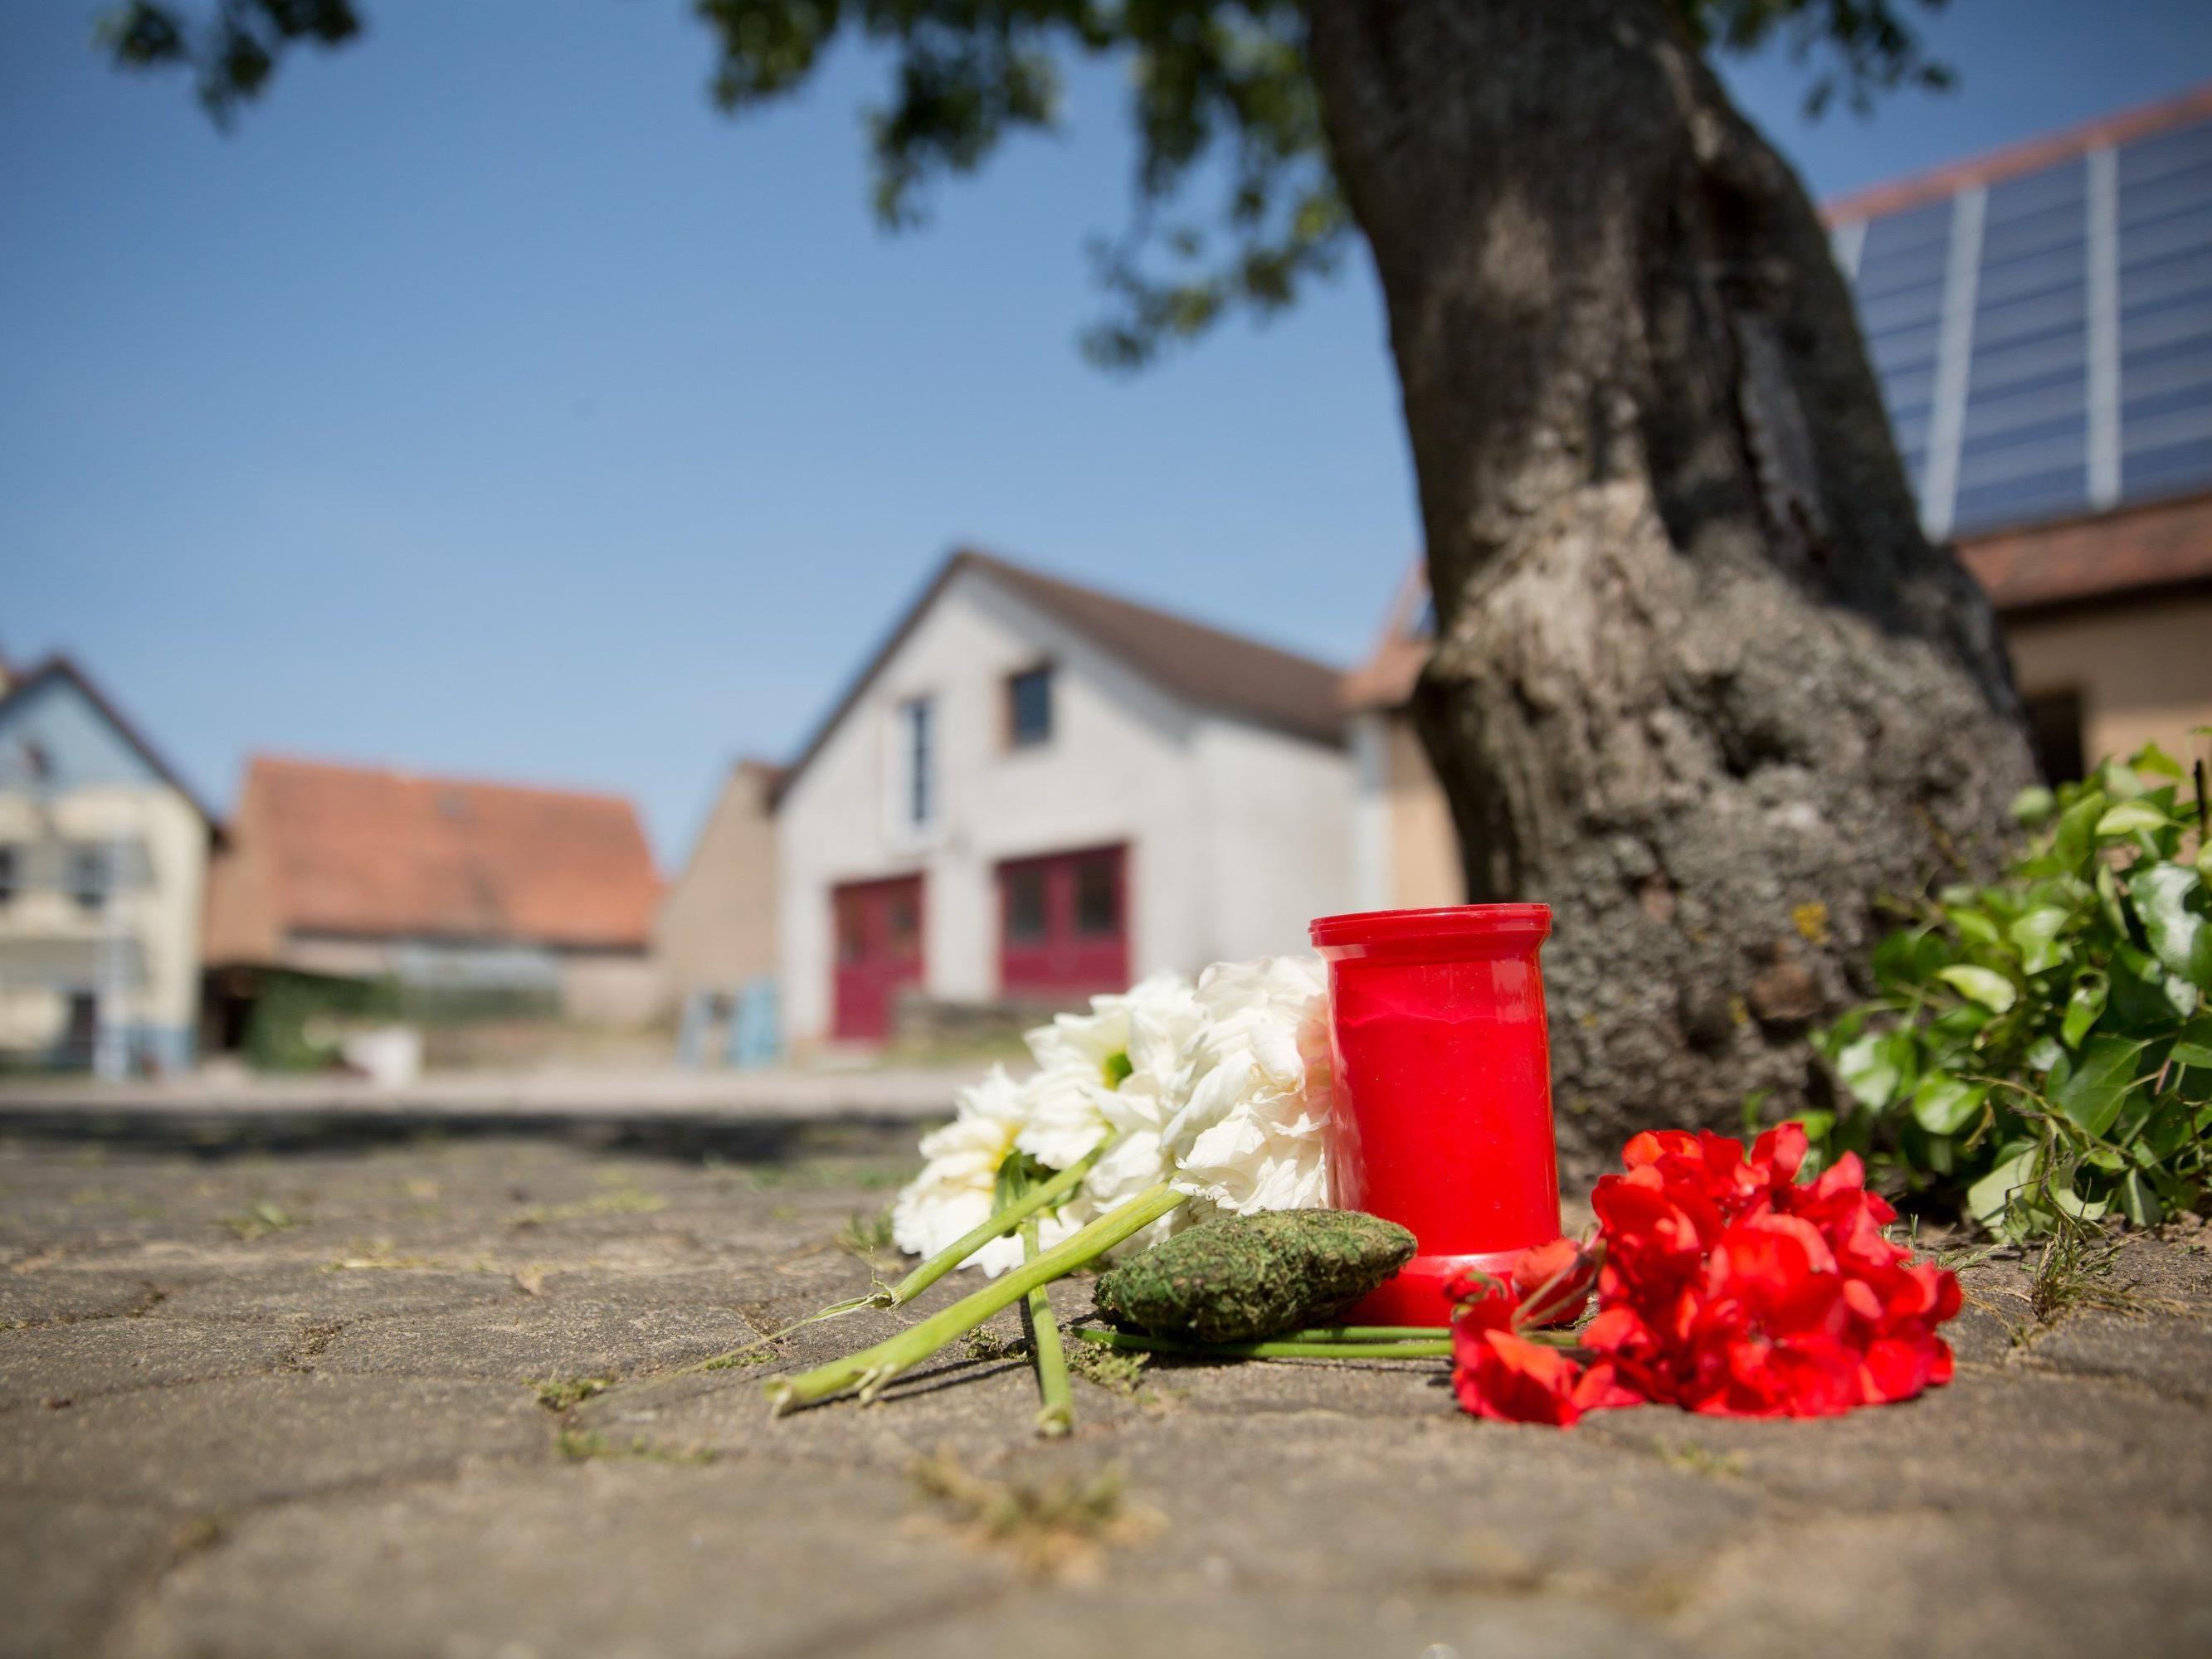 47-Jähriger soll zwei Menschen erschossen haben.